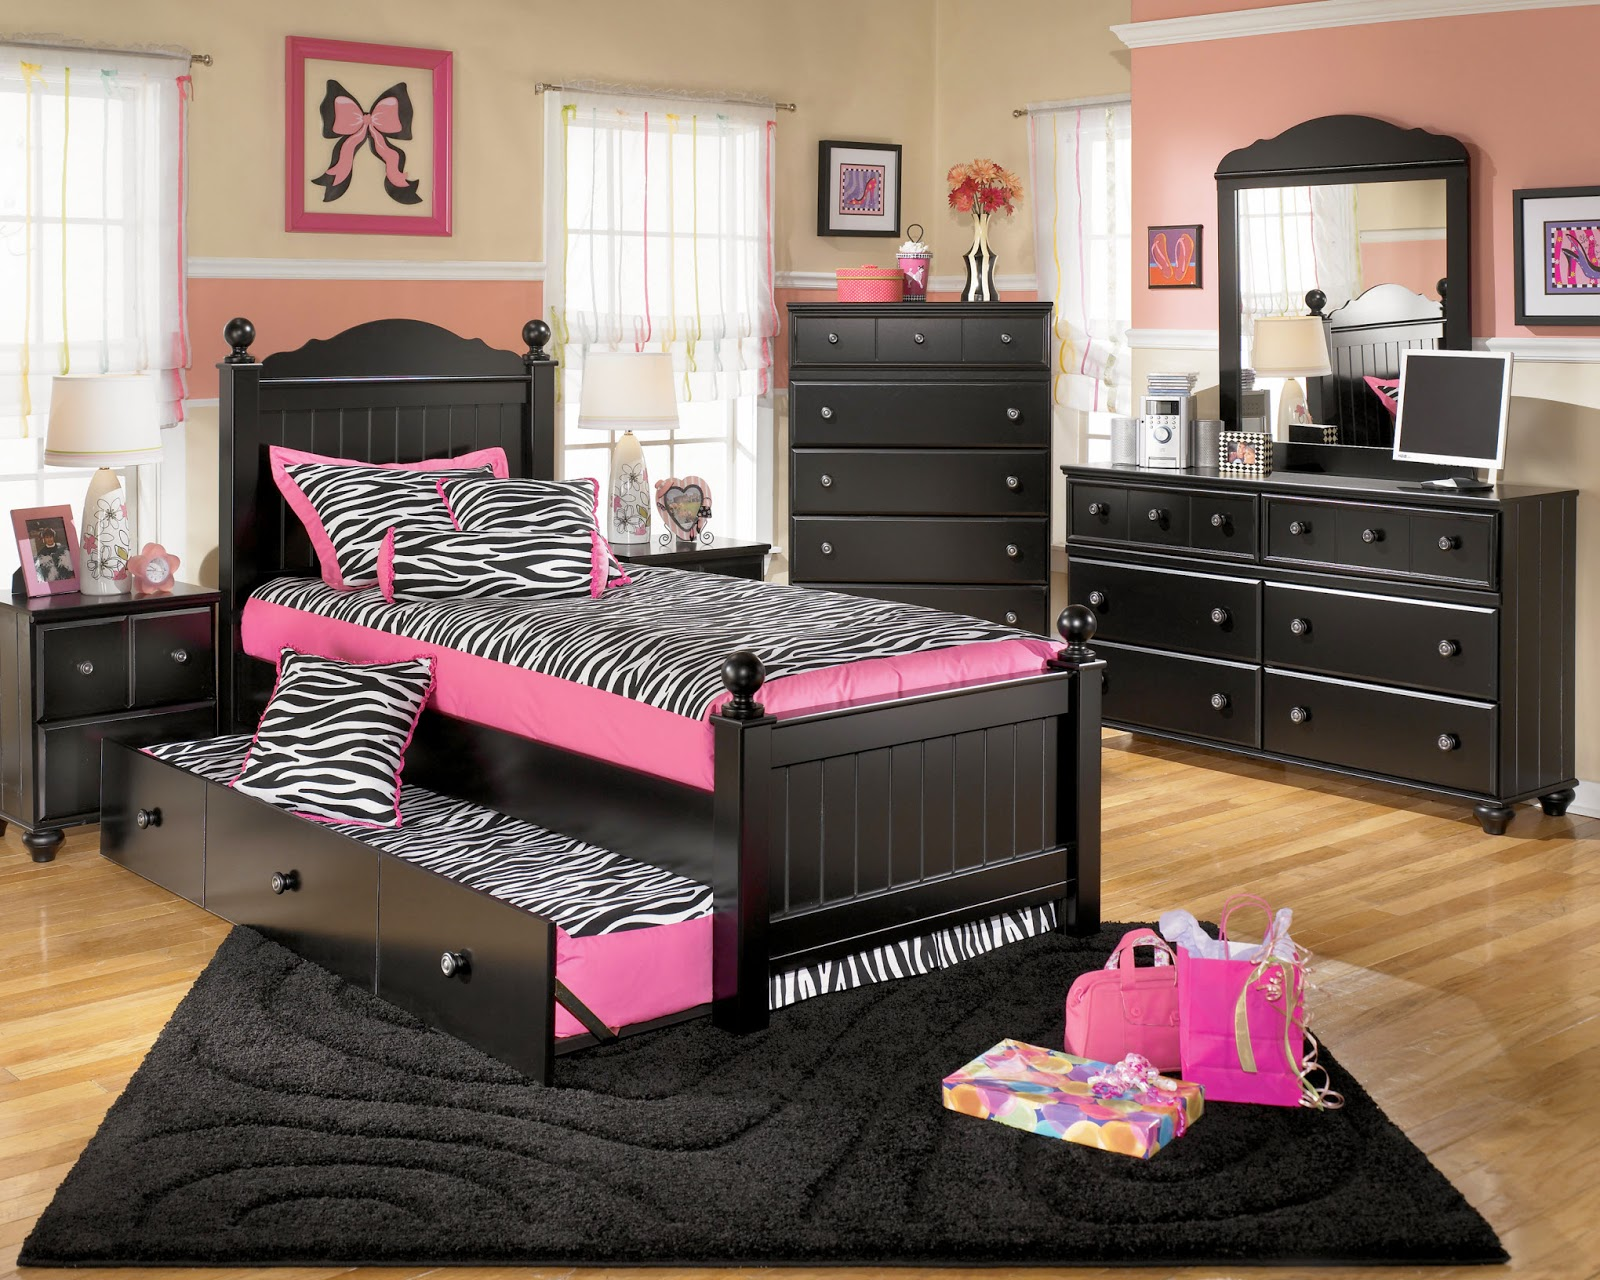 Stunning Bedroom Furniture For Girls s Home Design Ideas